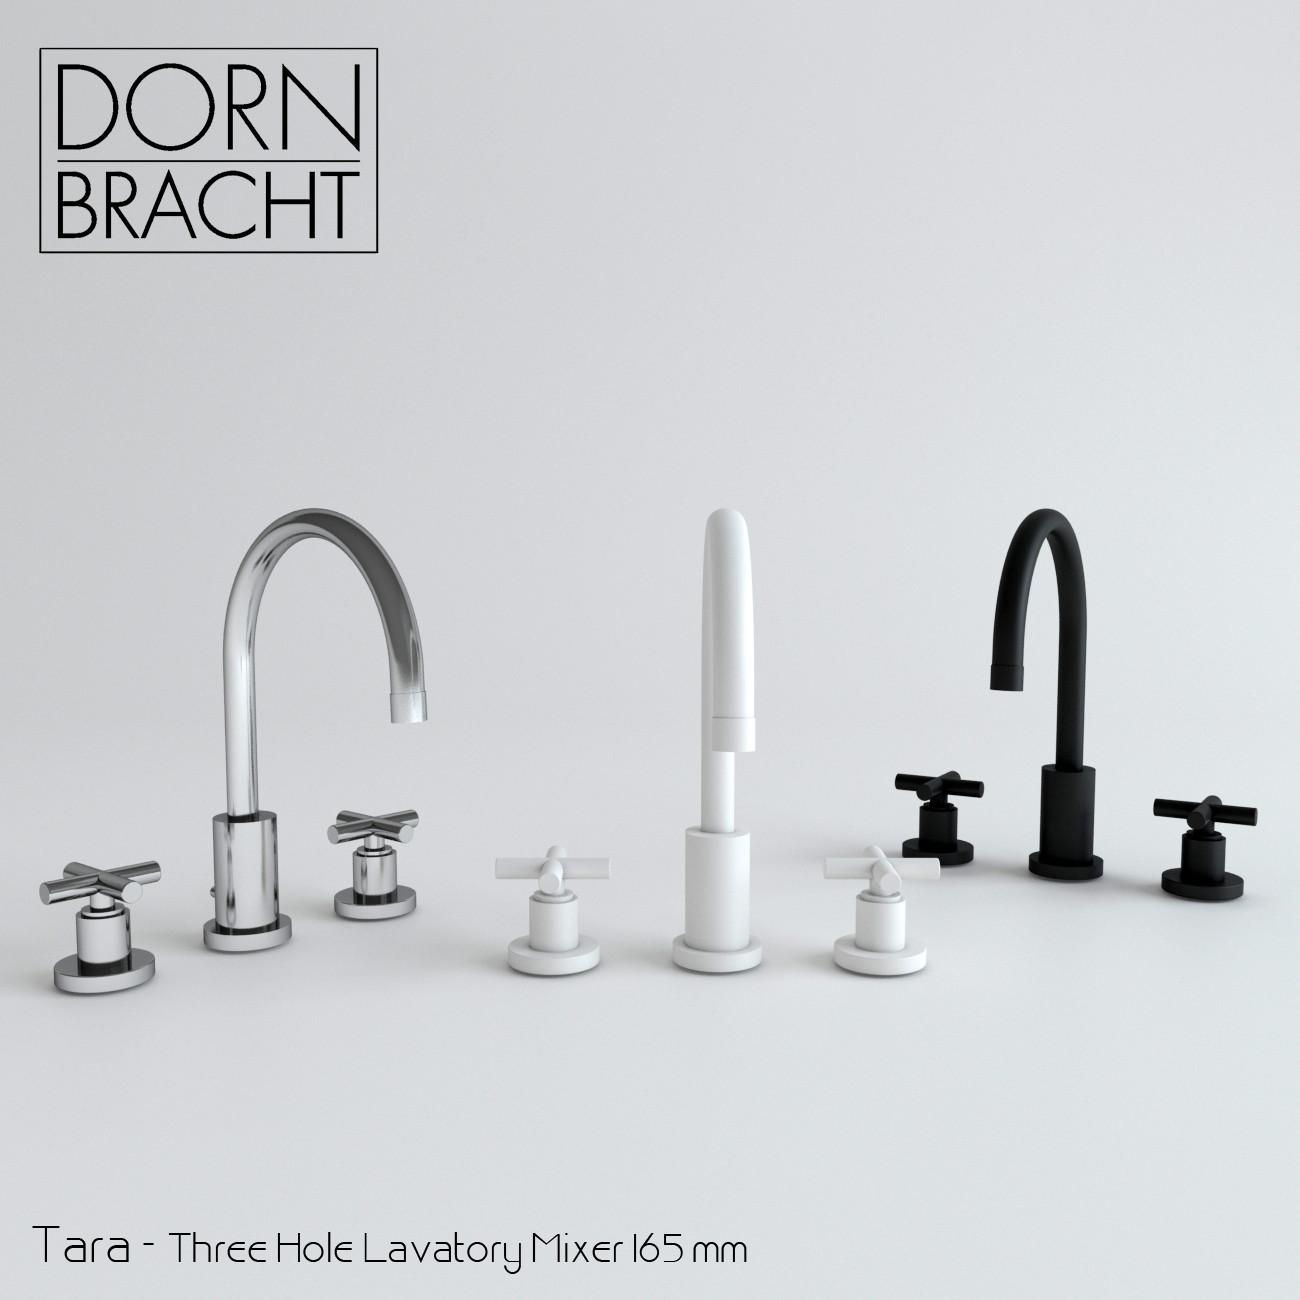 Dornbracht Tara Kitchen Faucet Dornbracht 3d Models